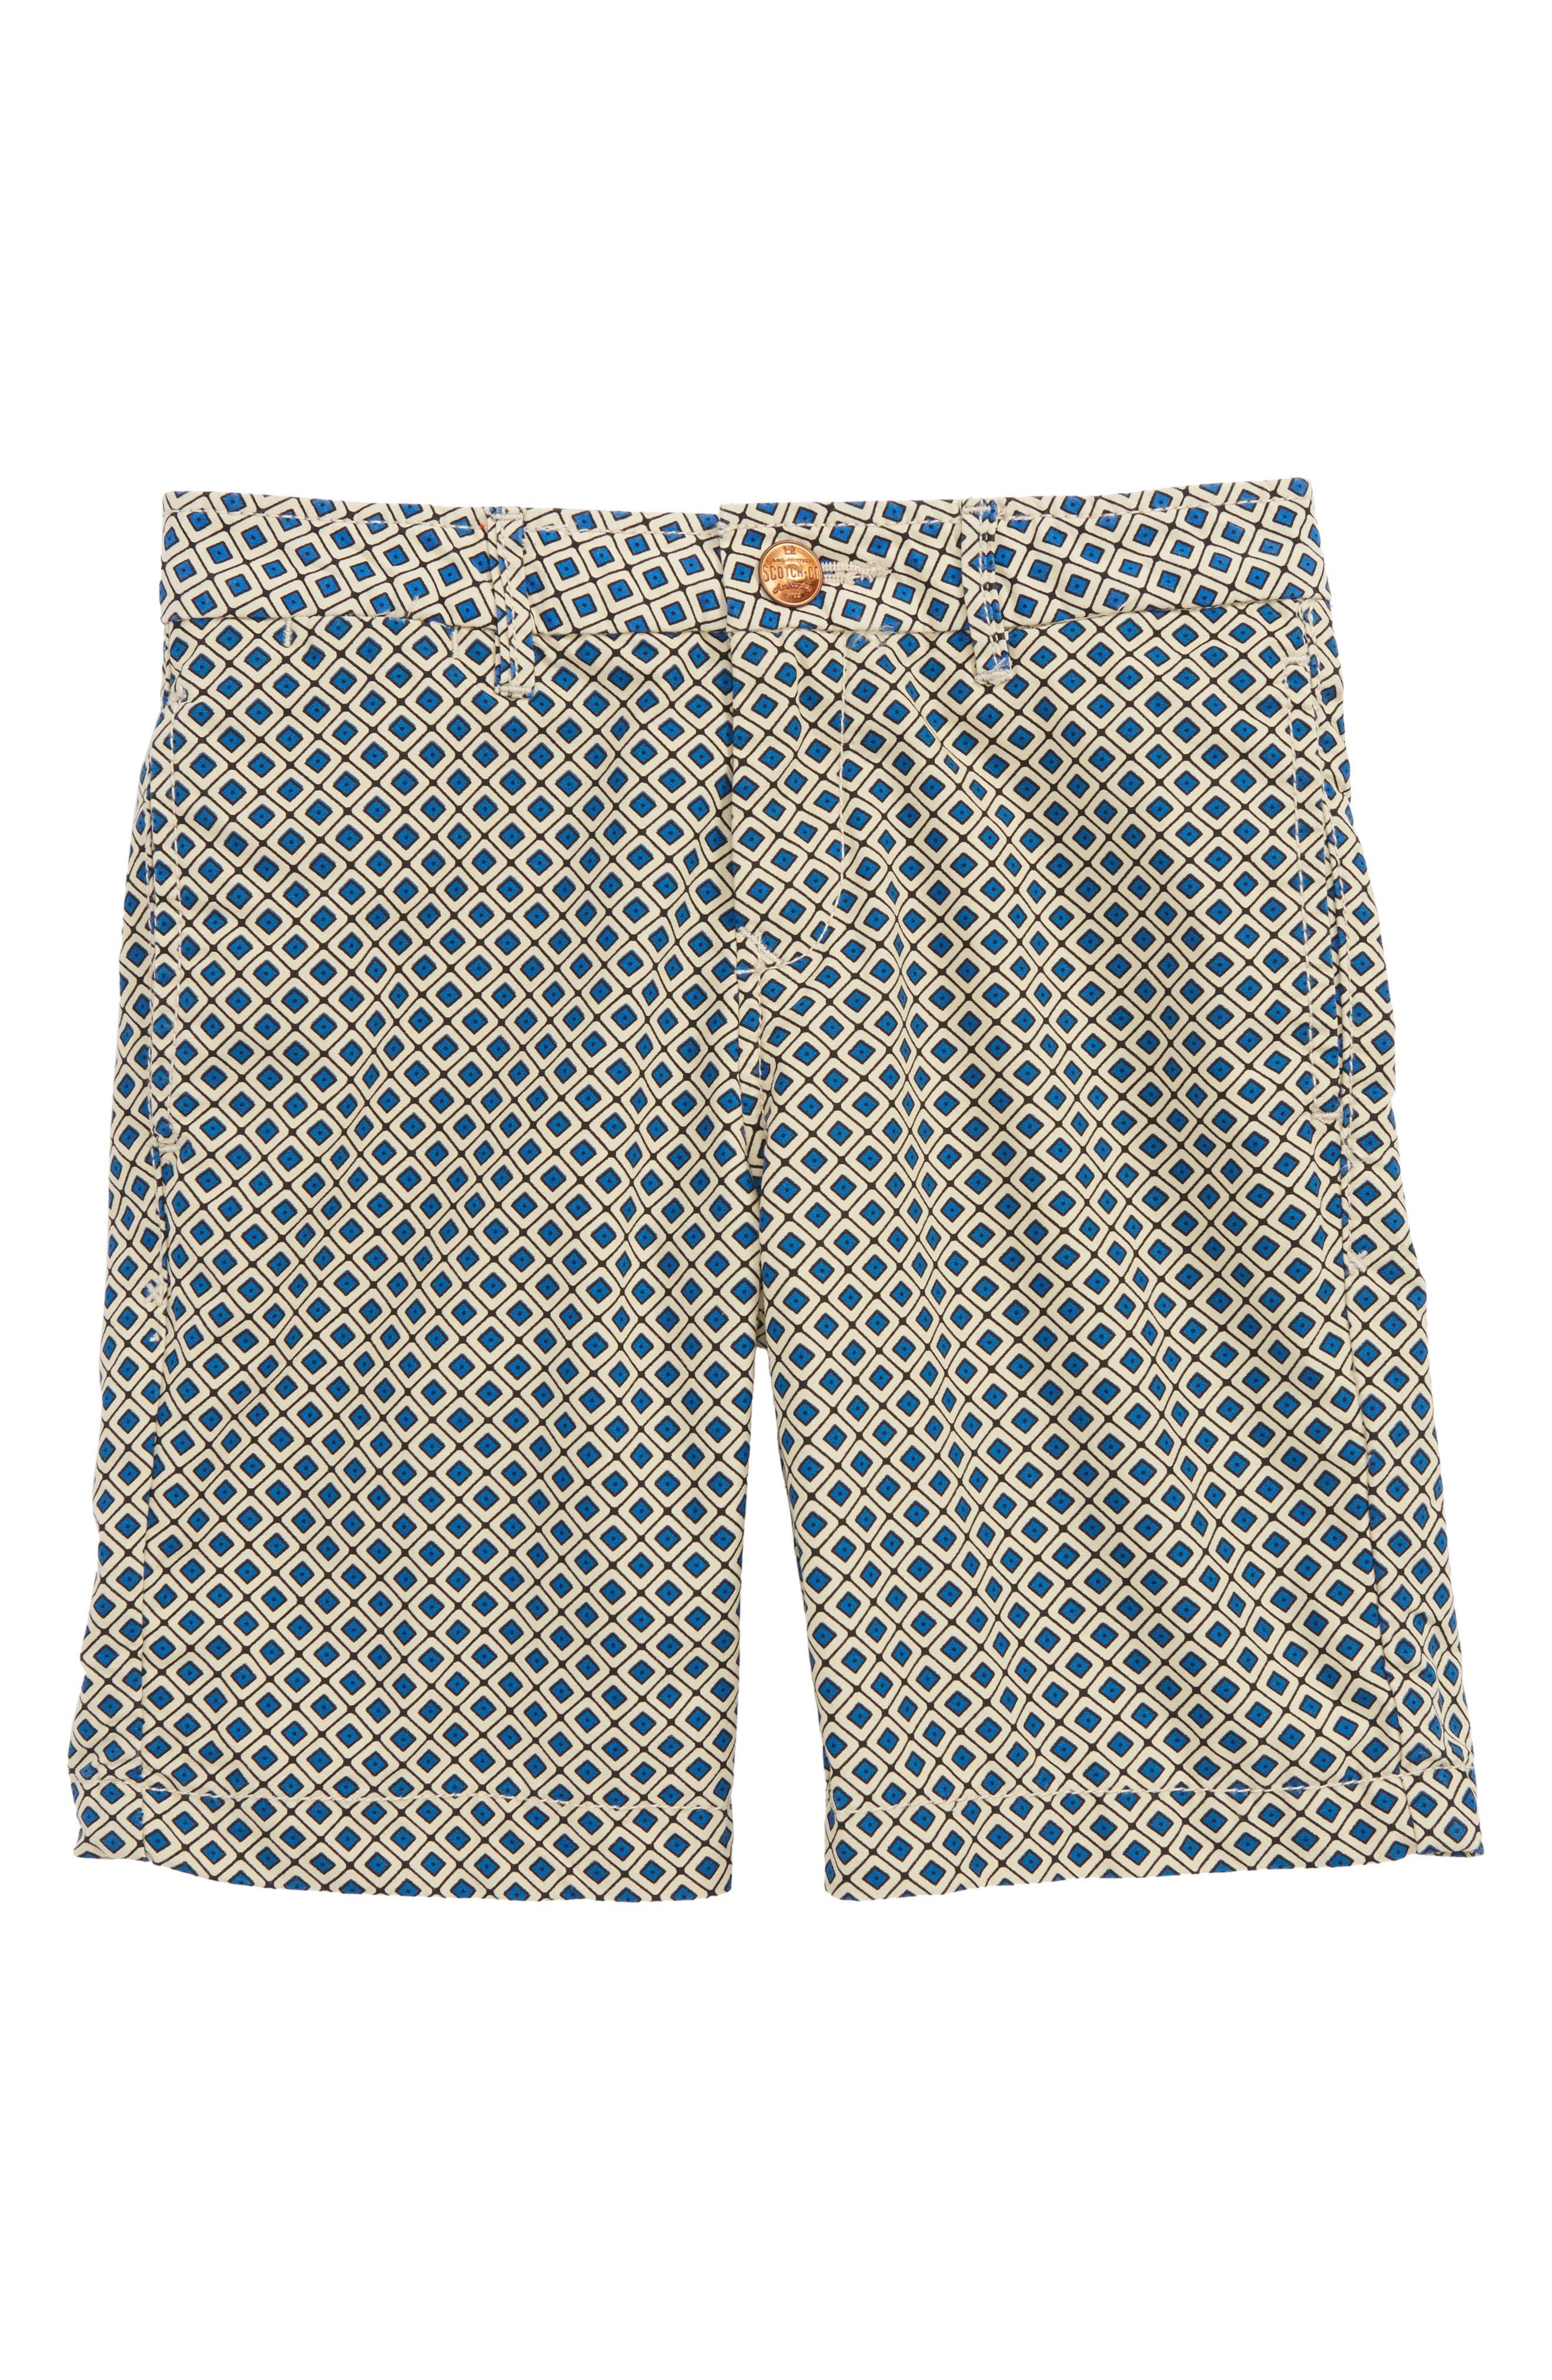 Poplin Shorts,                         Main,                         color, Combo Stripes